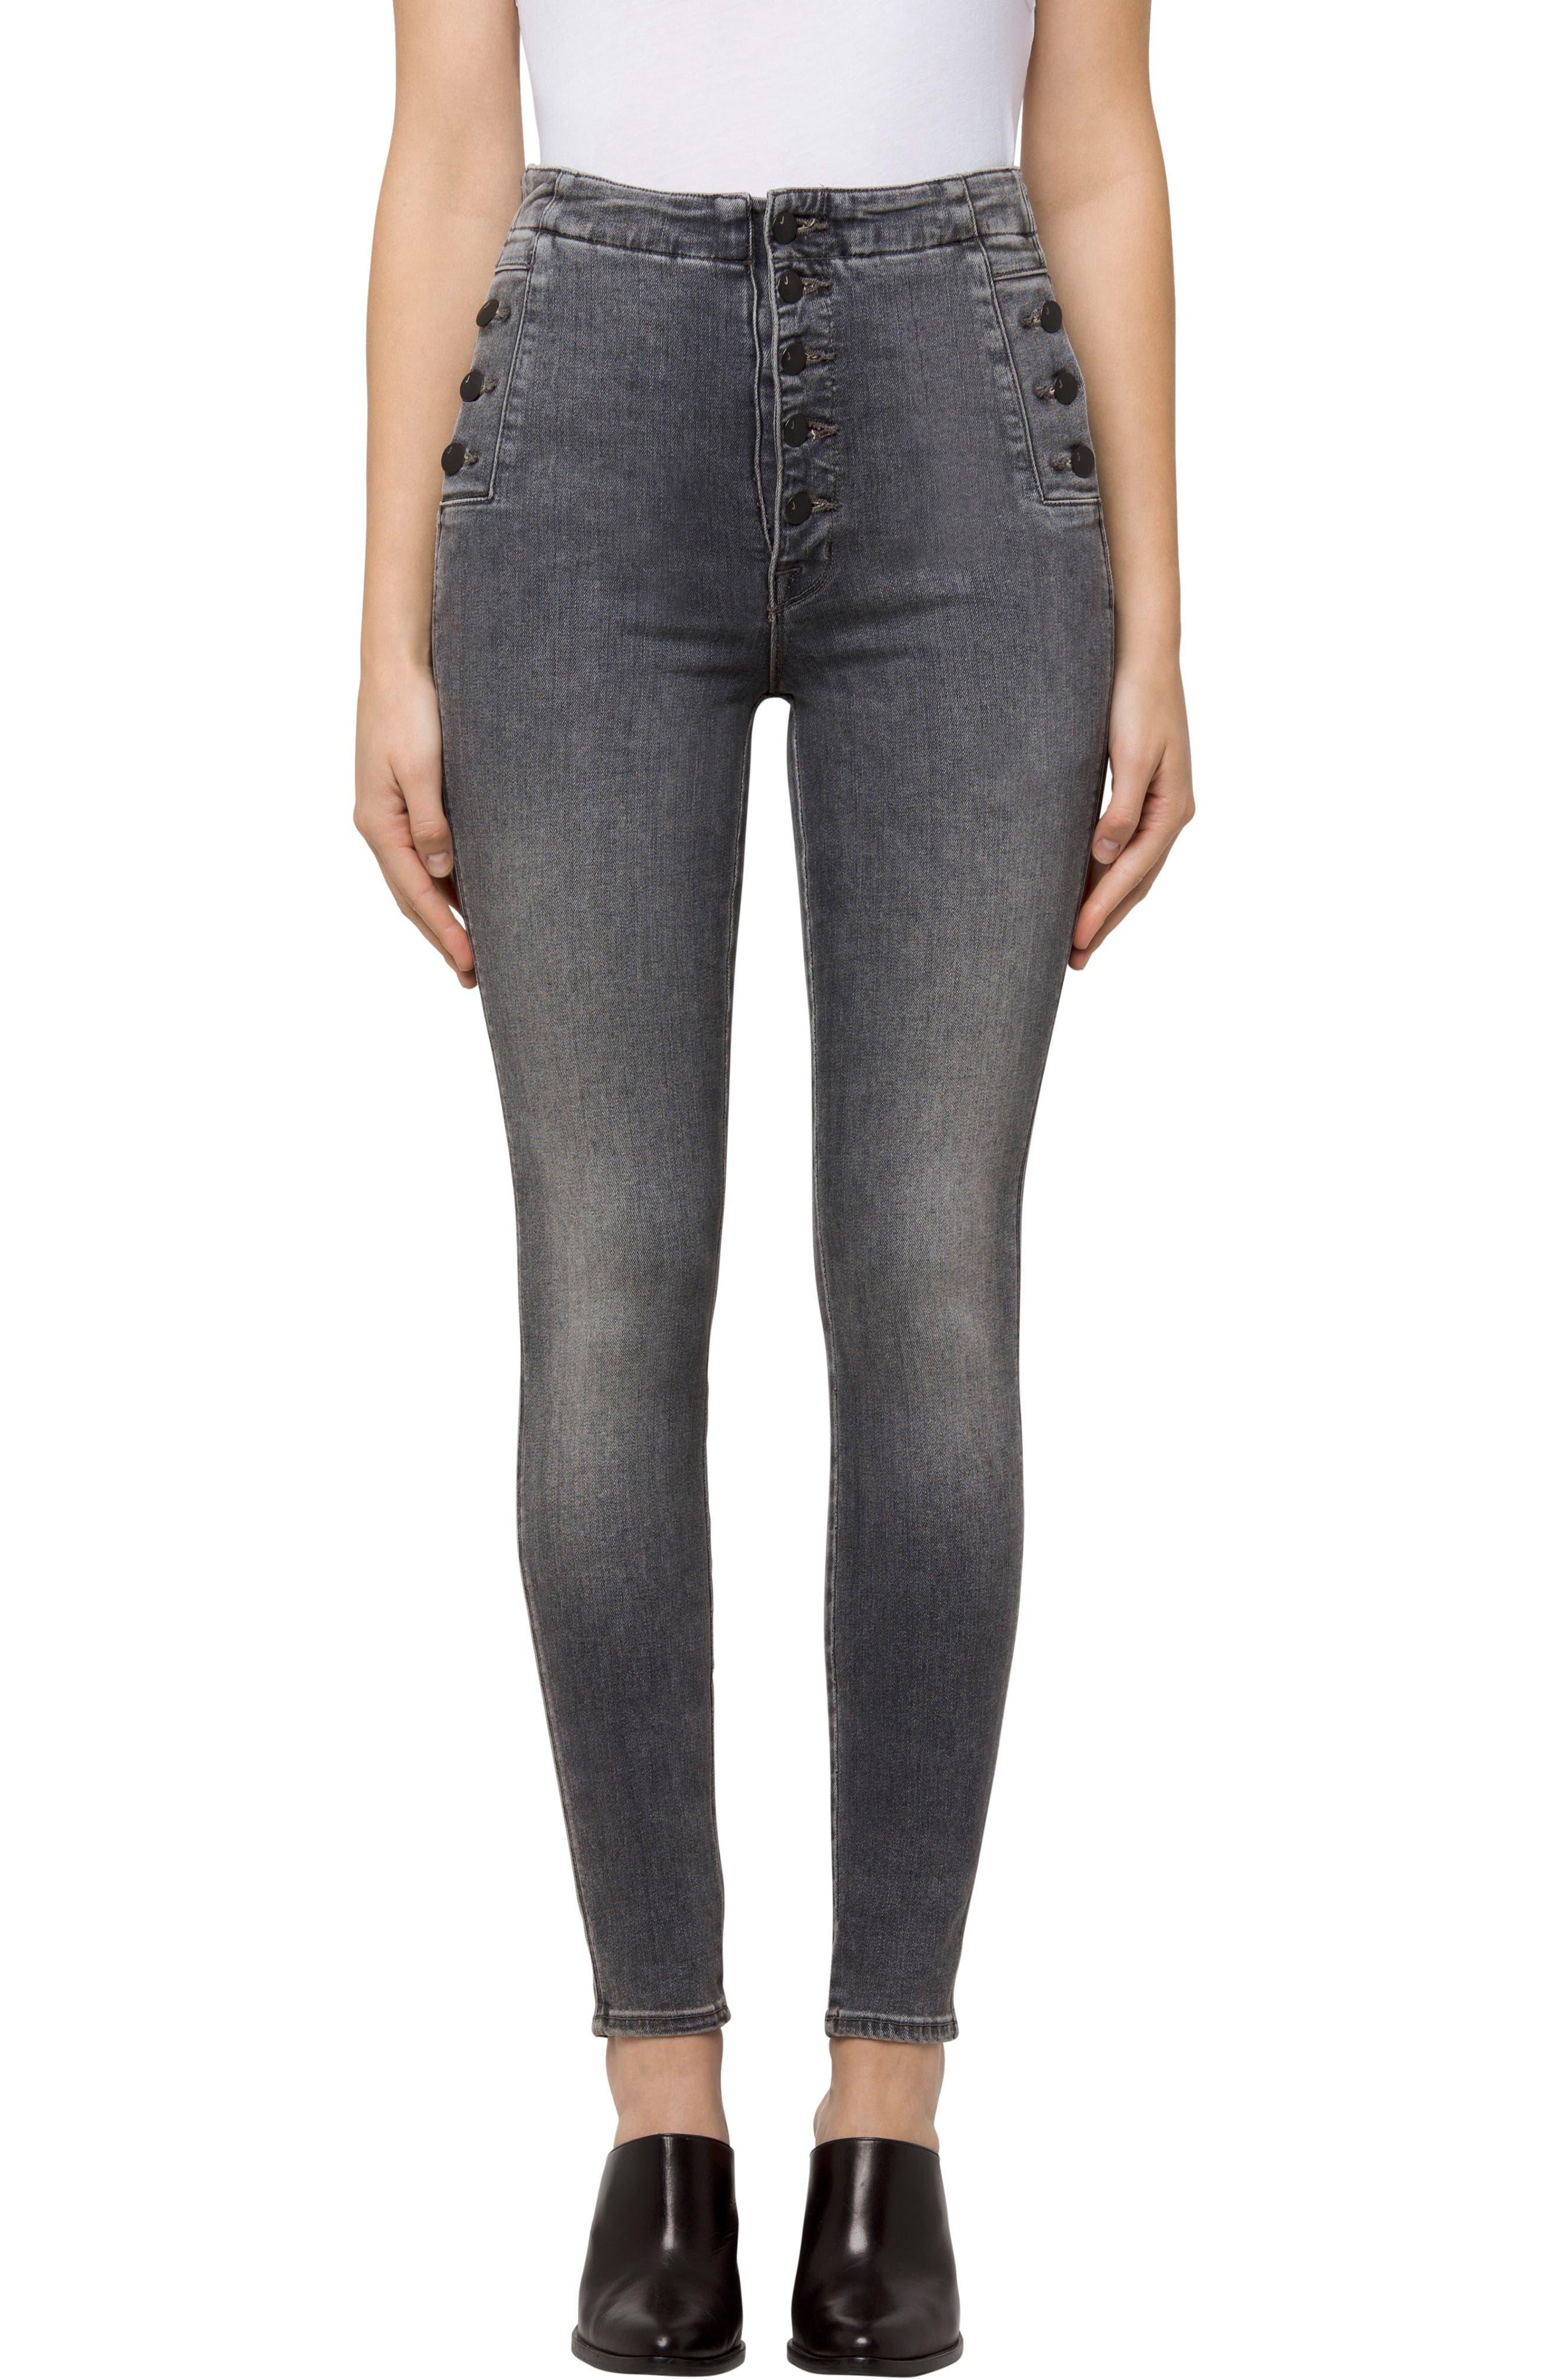 Alternate Image 1 Selected - J Brand Natasha Sky High Button Skinny Jeans (Earl Grey)